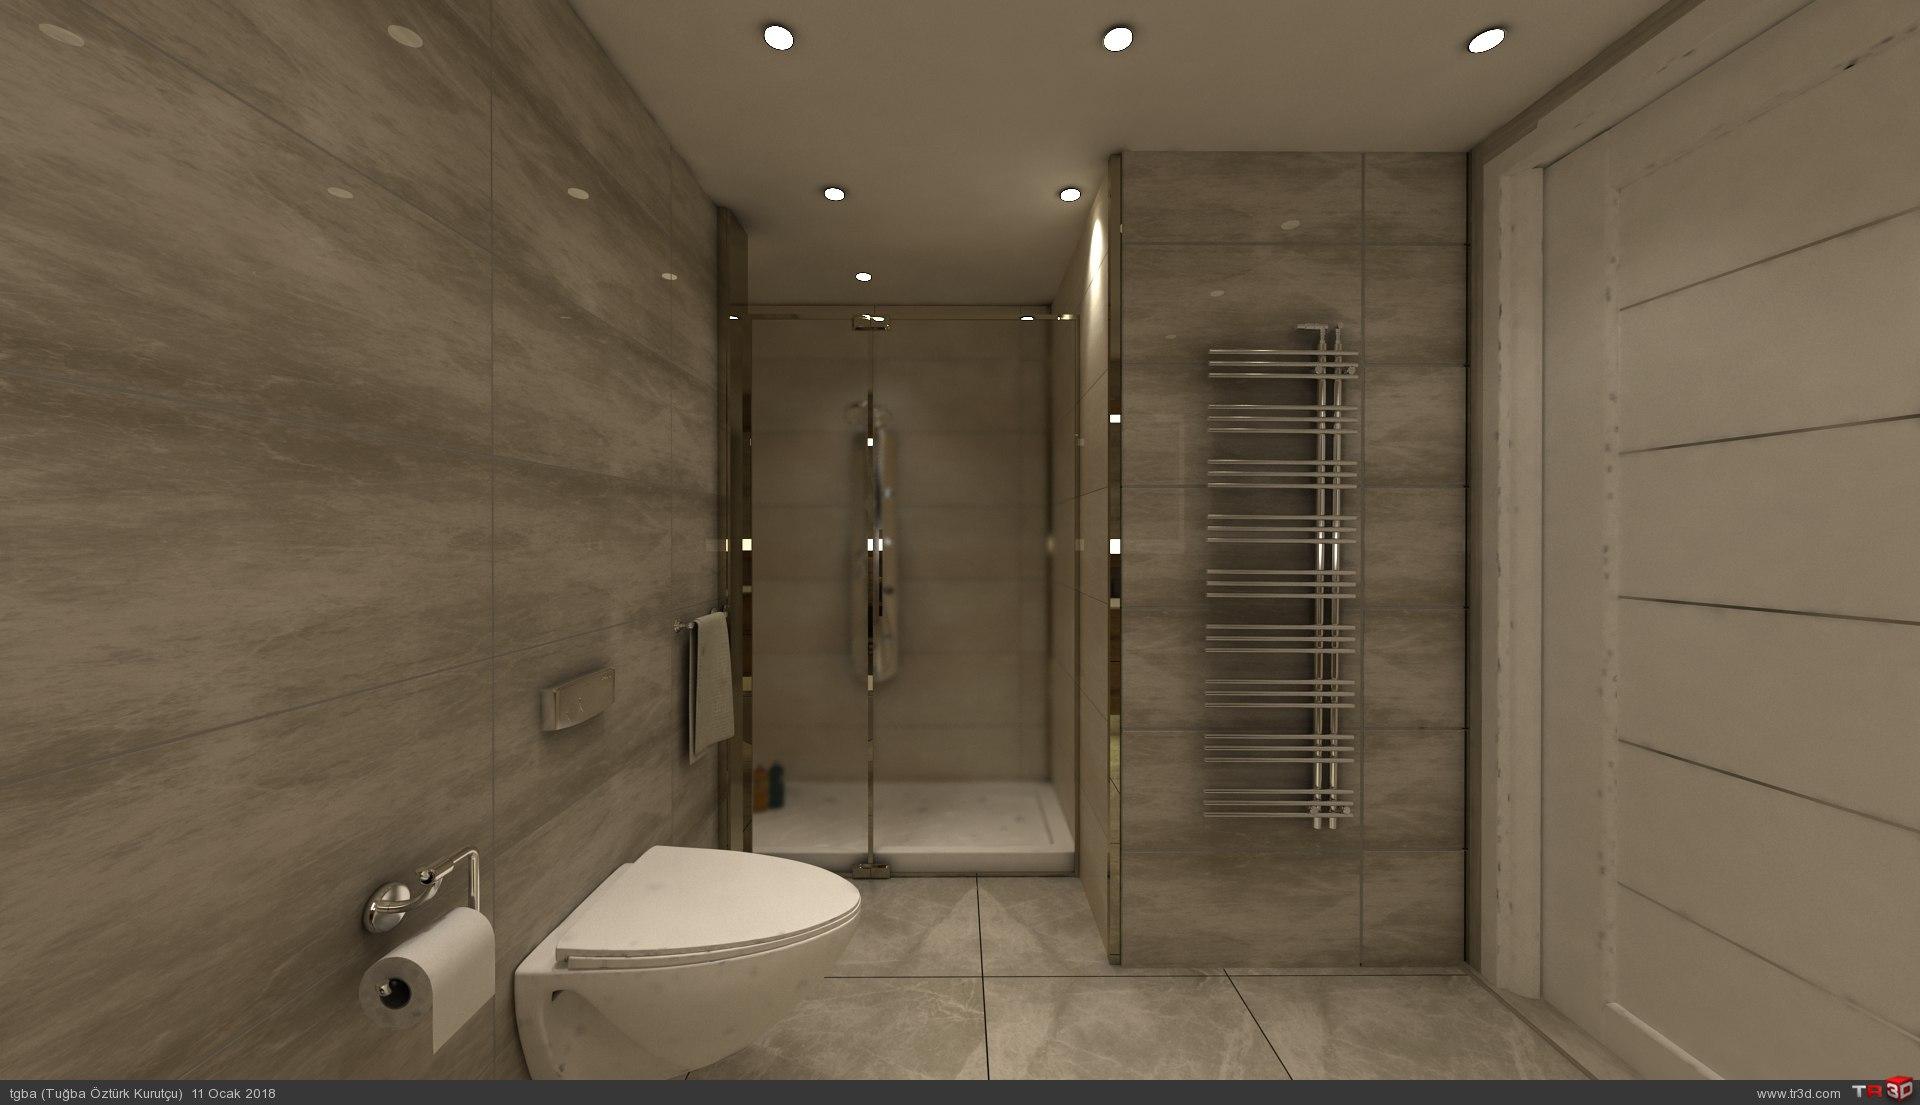 Banyo/bathroom Sade 3